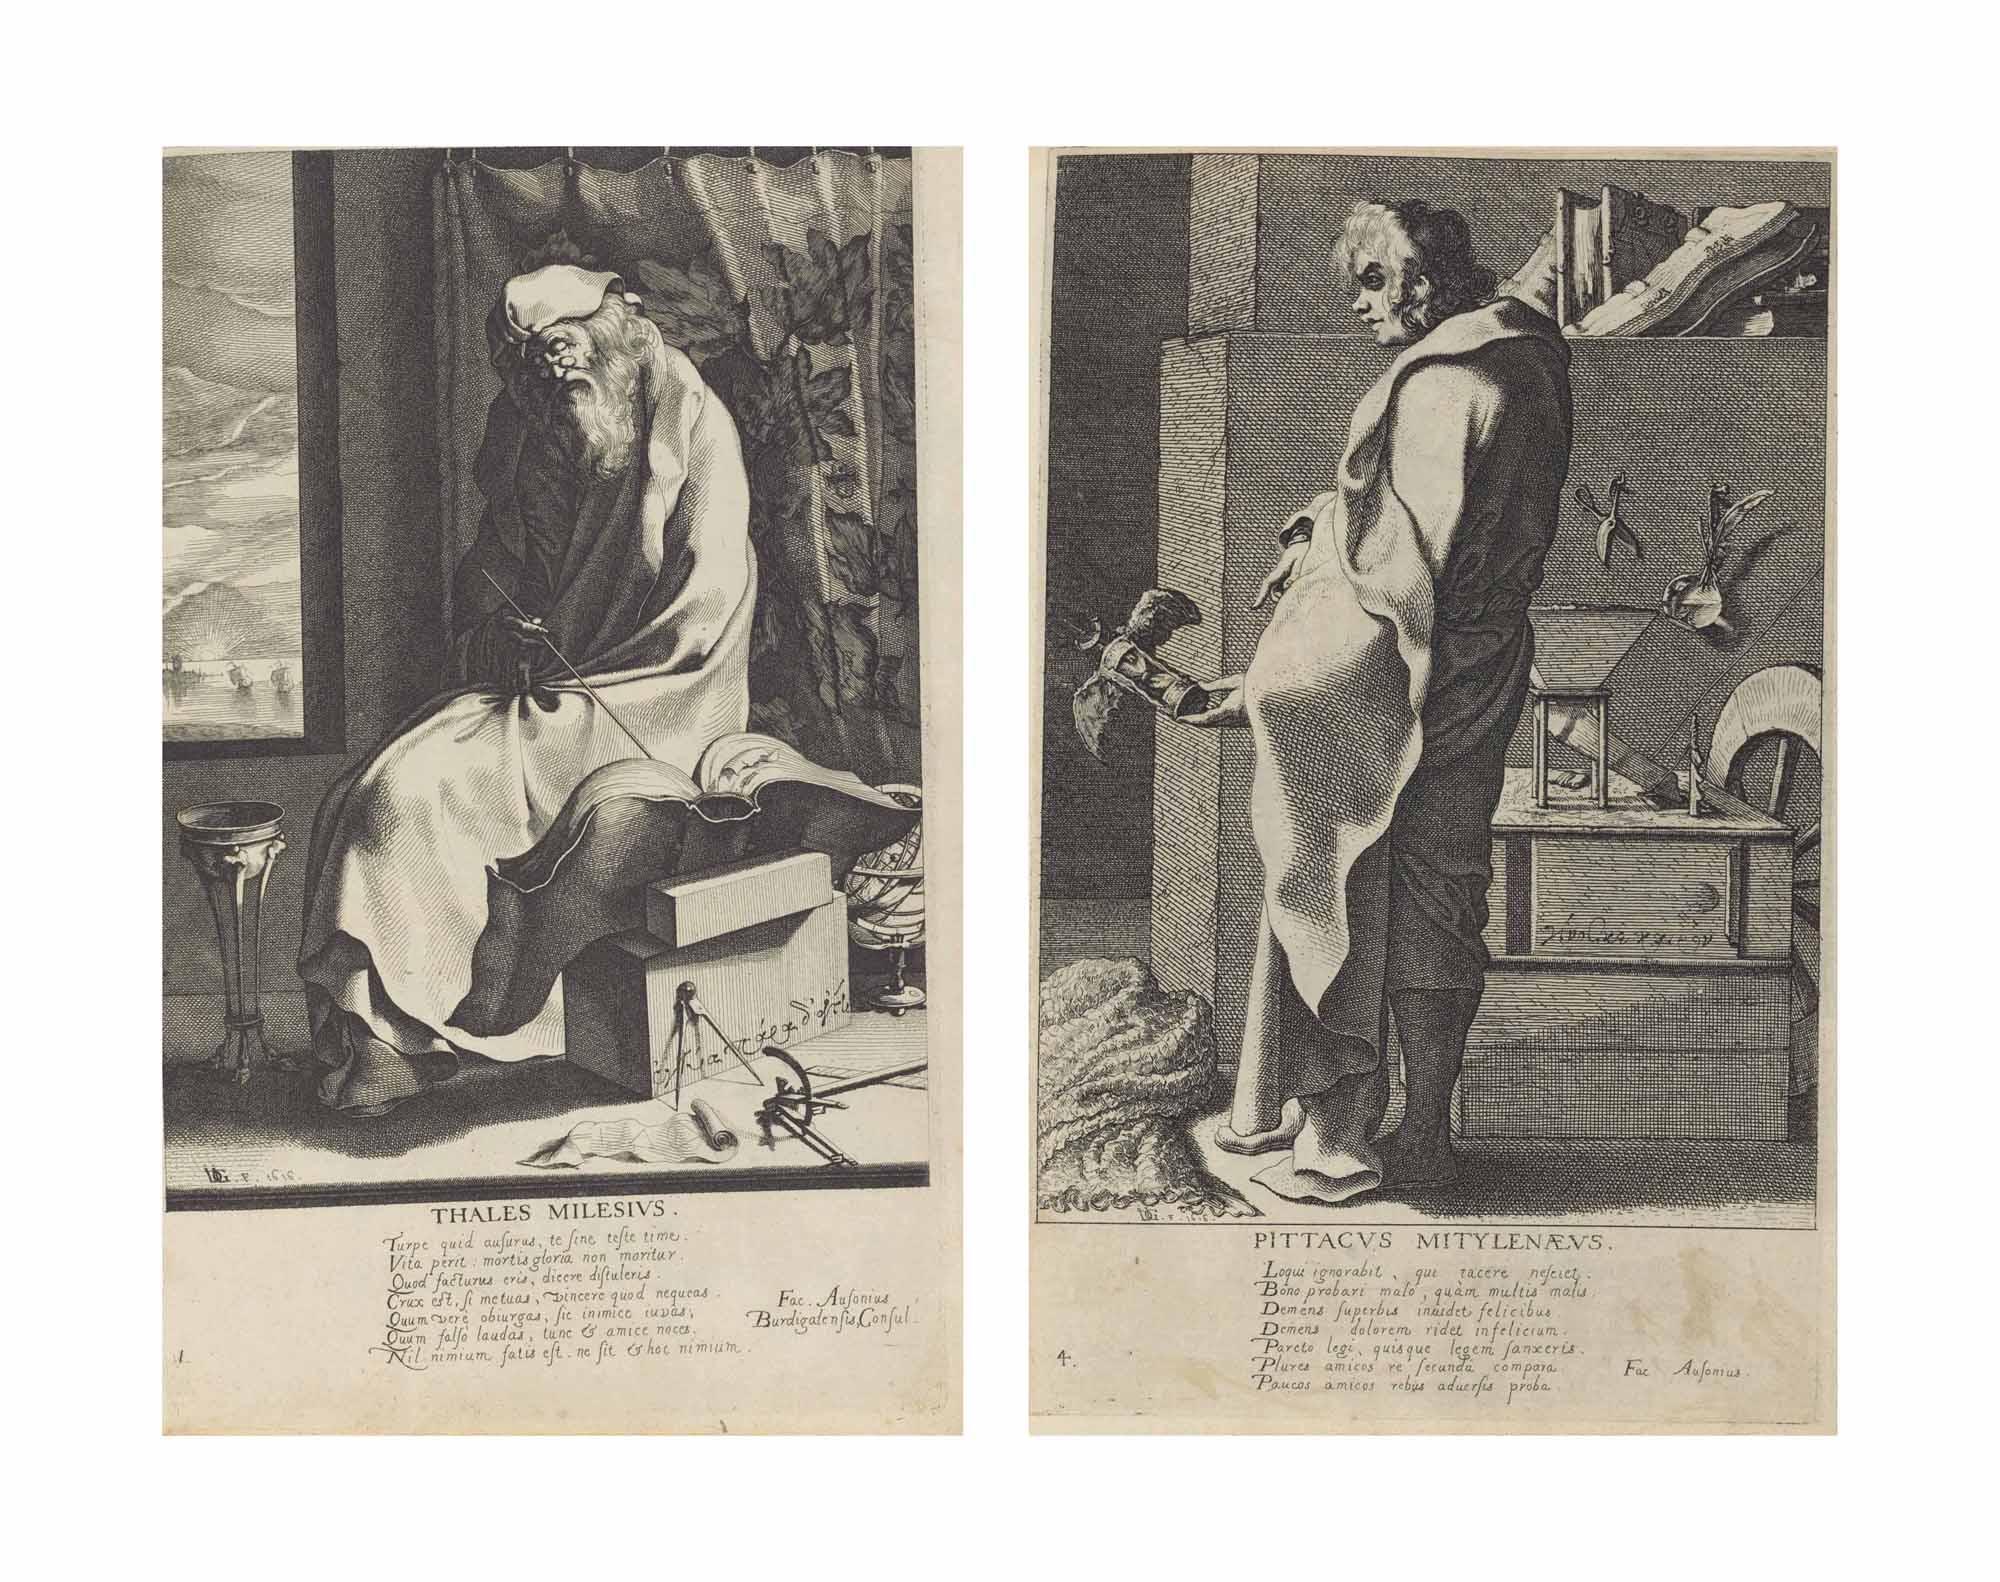 The Seven Wise Men of Greece (New Hollstein 5-11)